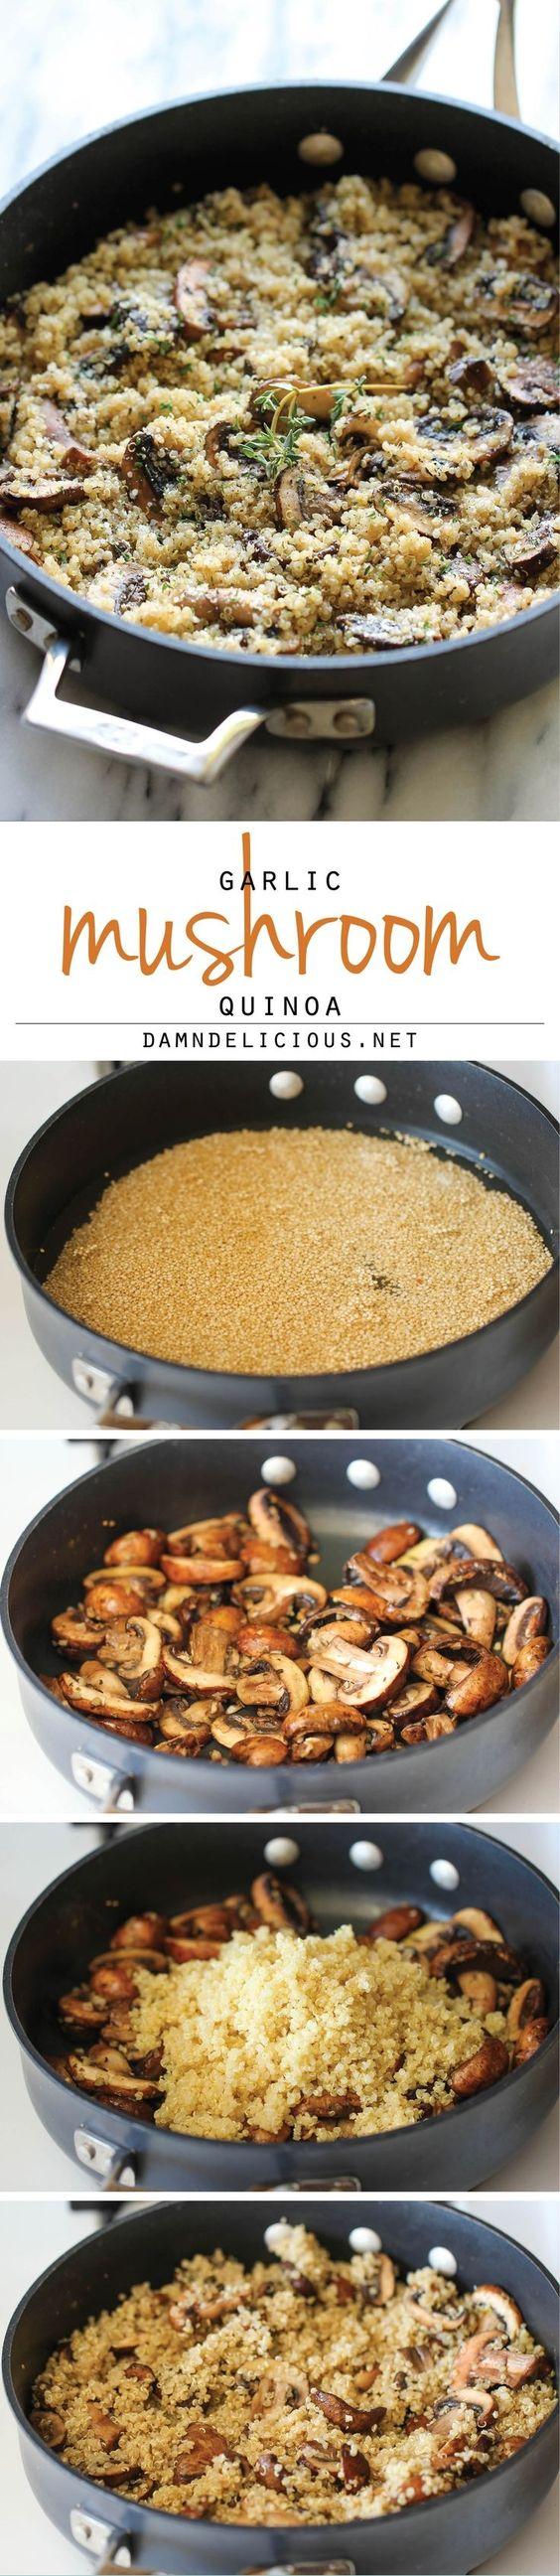 Garlic Mushroom Quinoa - #Garlic #mushroom #Quinoa